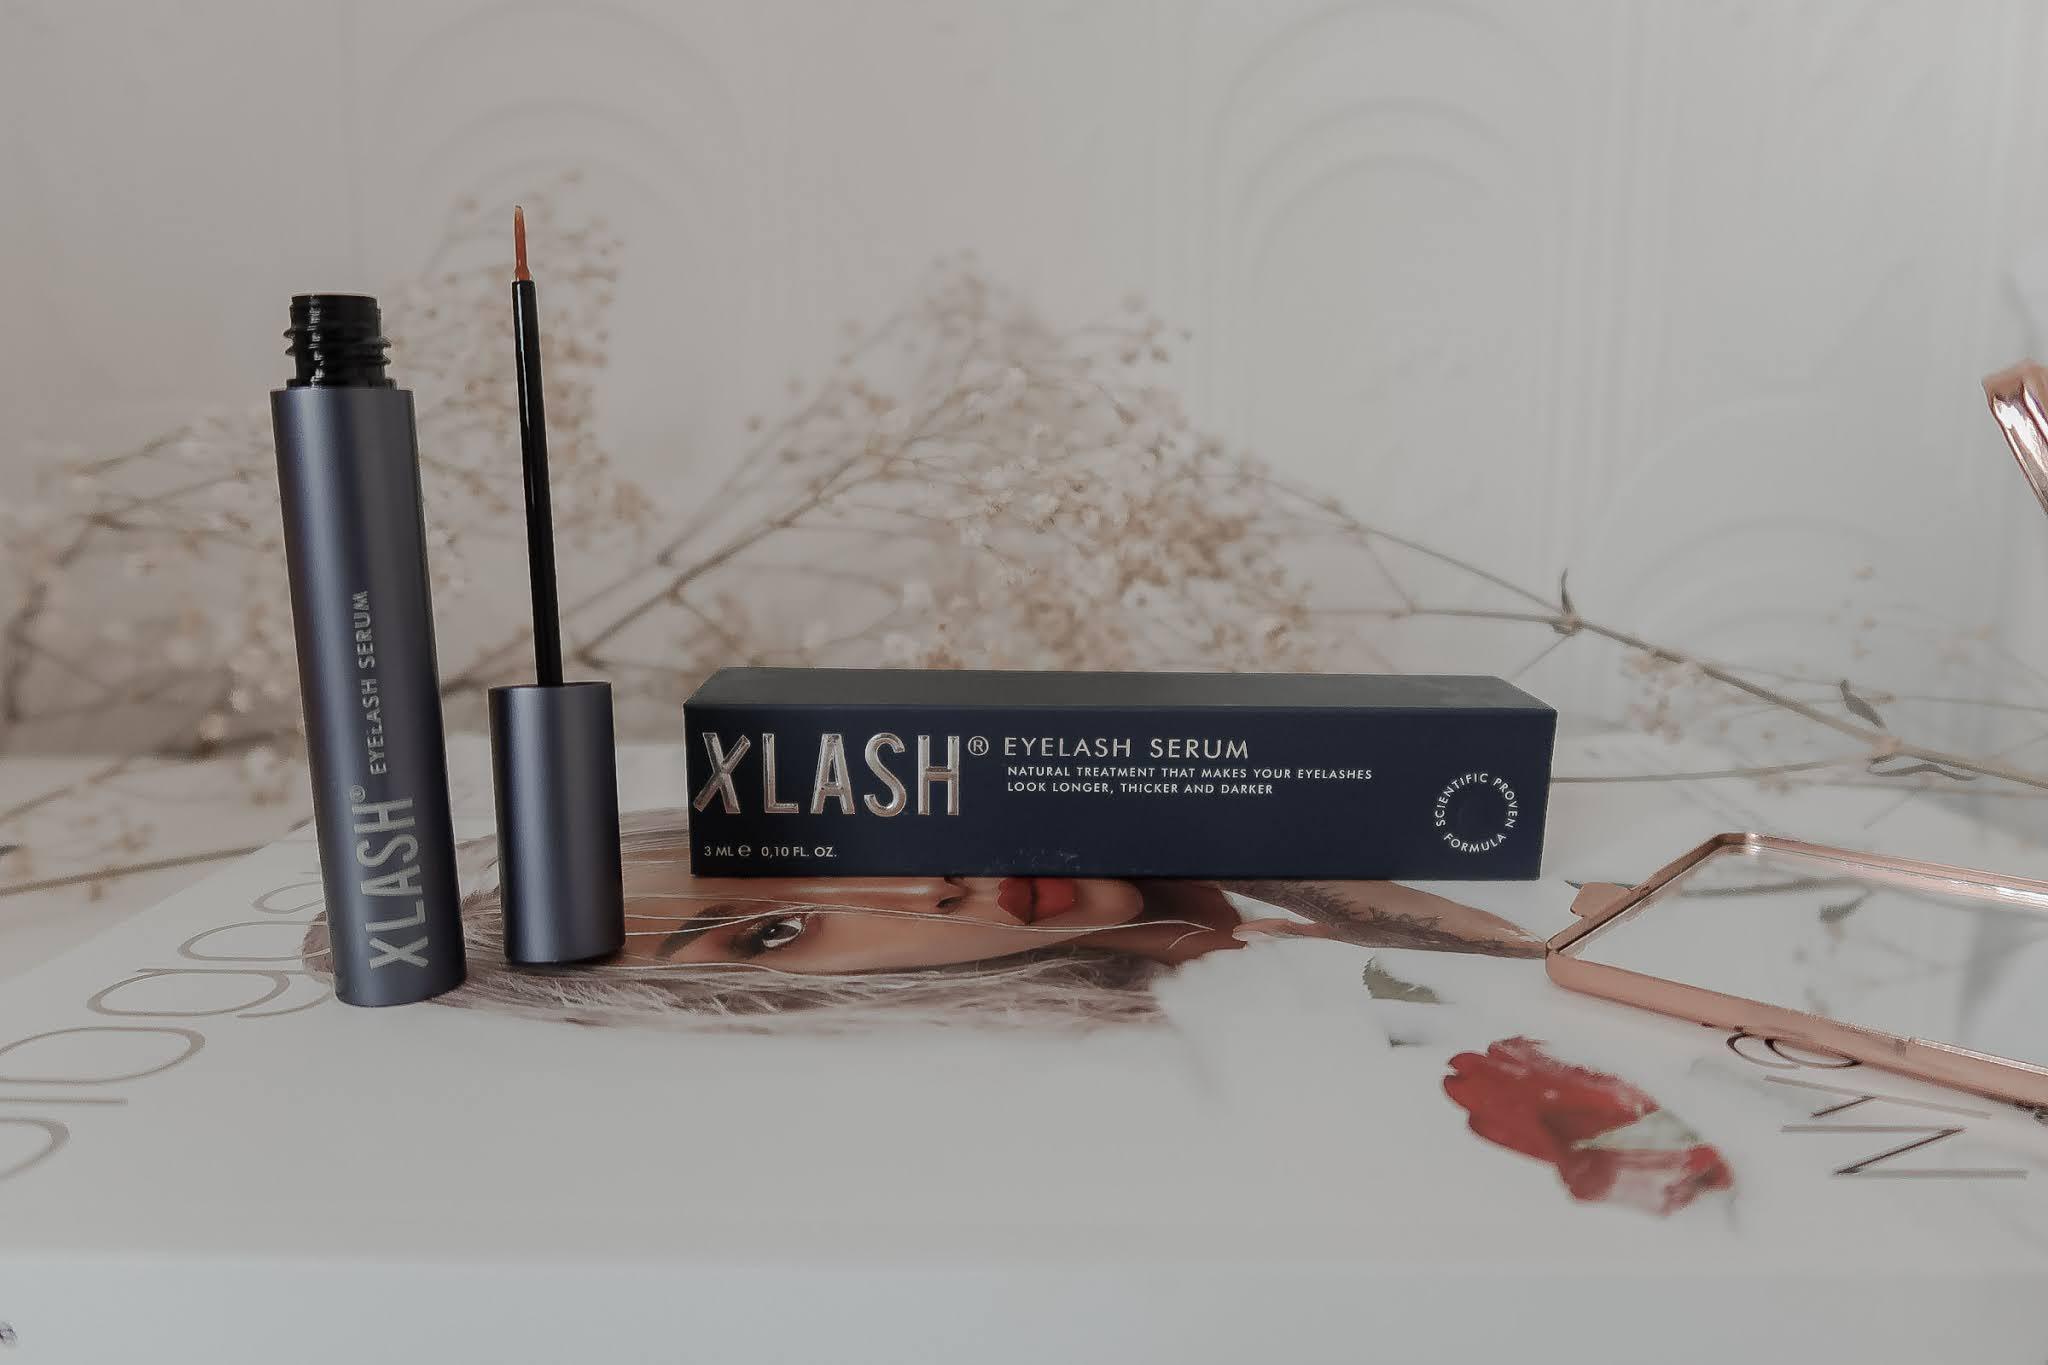 Xlash Eyelash Serum: A Review